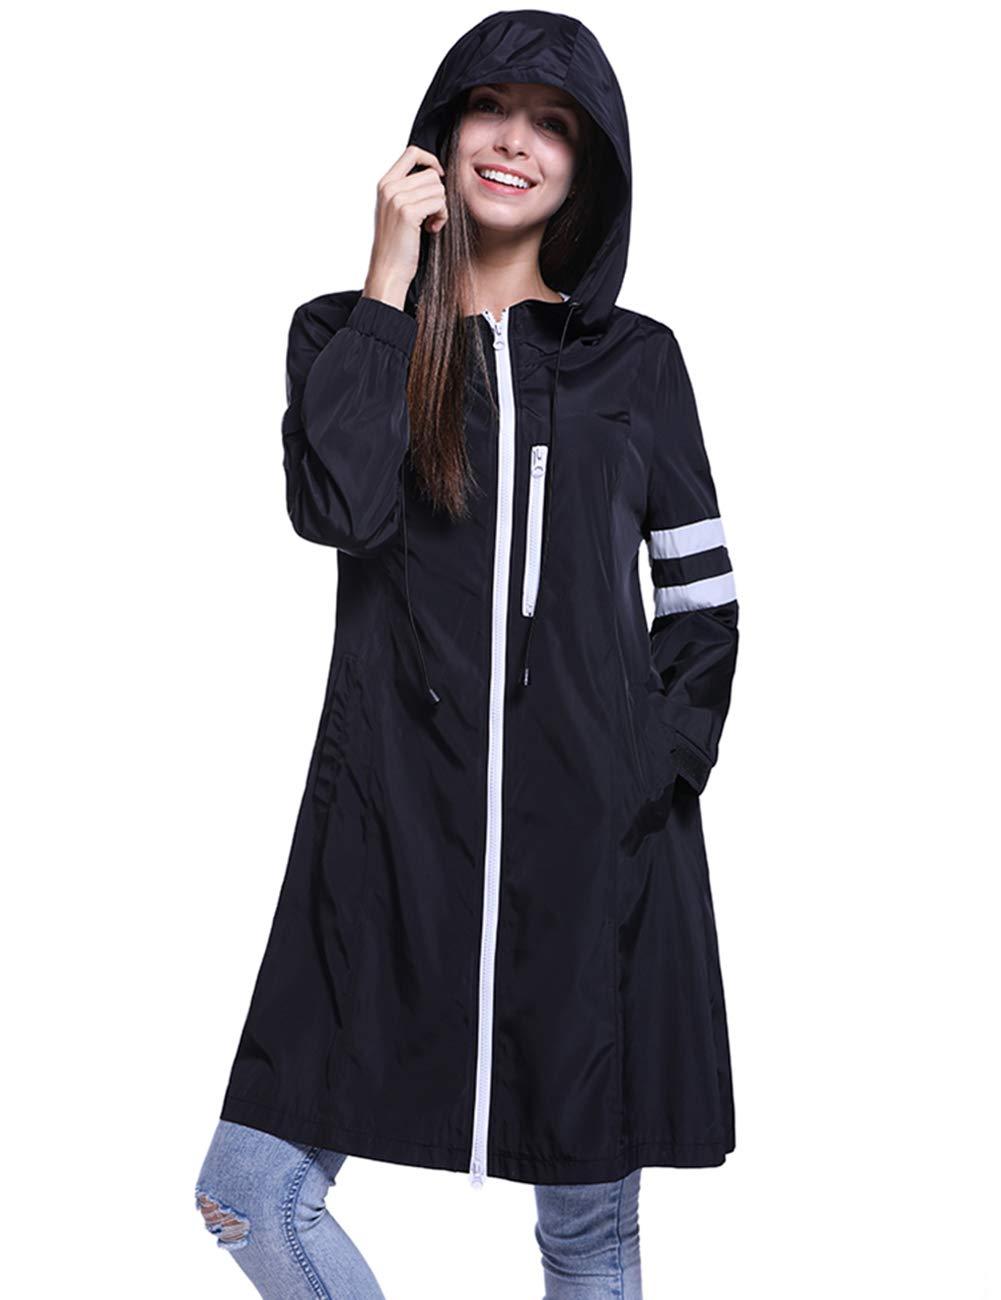 Fancyqube Women's Lightweight Packable Active Outdoor Rain Jacket Hooded Waterproof Breathable Raincoat Black L